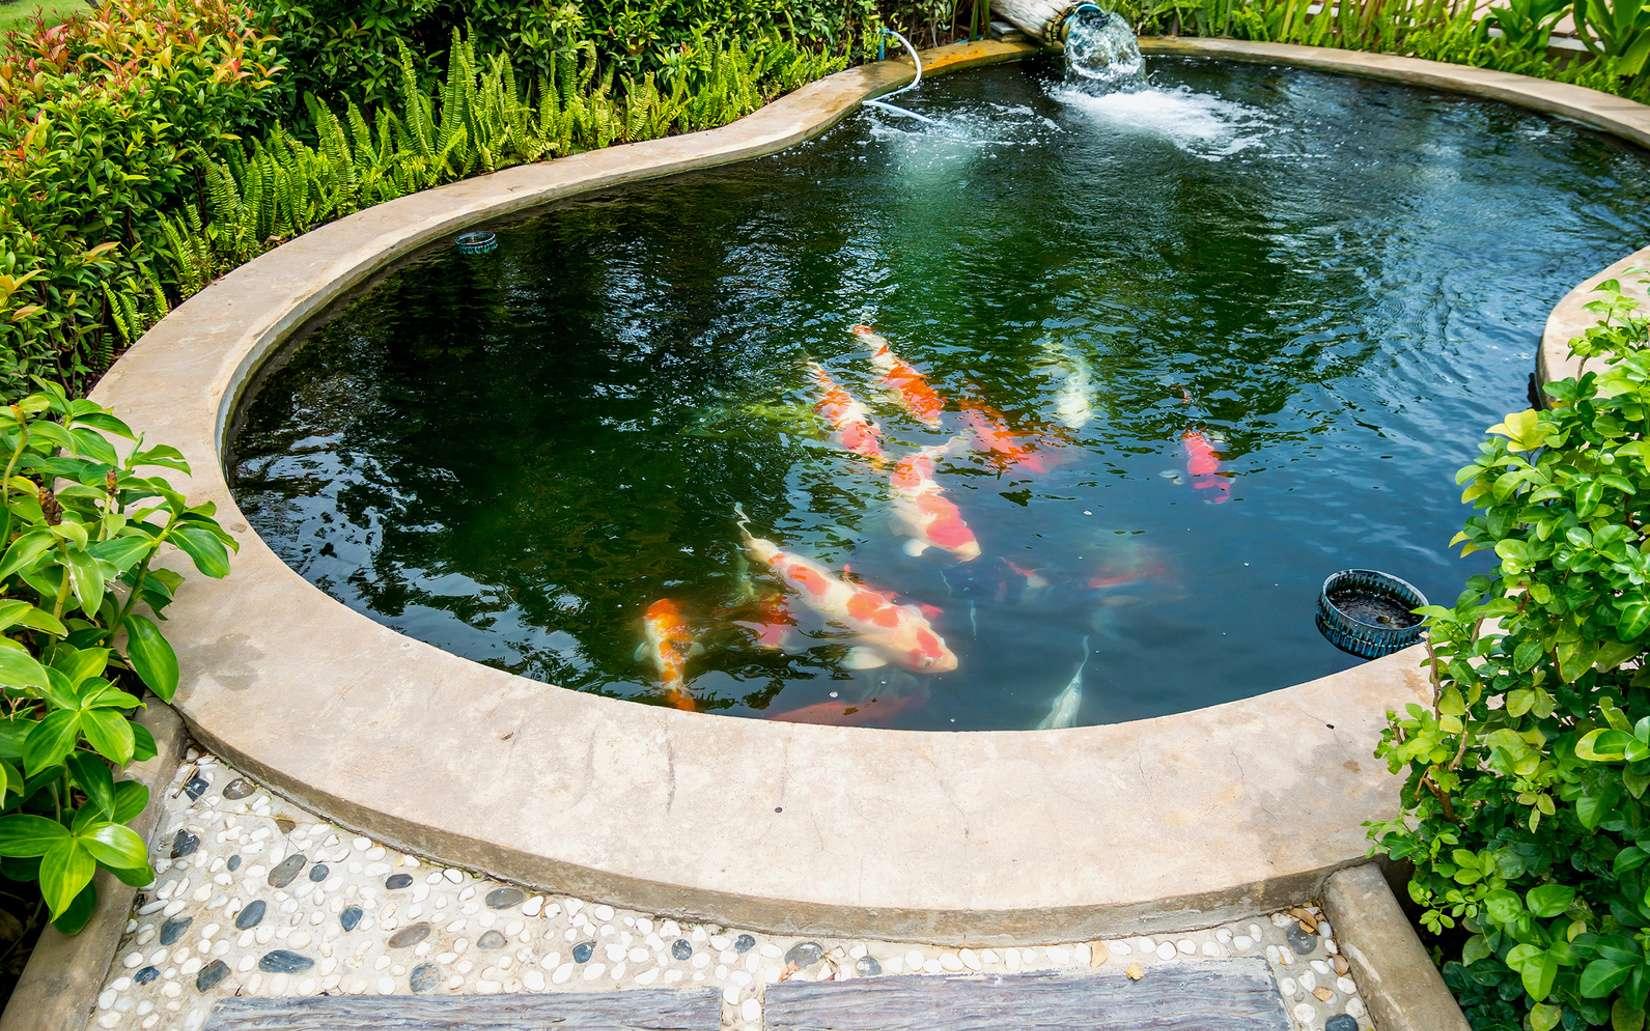 Bassin de jardin : quand introduire des poissons ? Ici, des carpes koï. © Kwangmoo, Fotolia